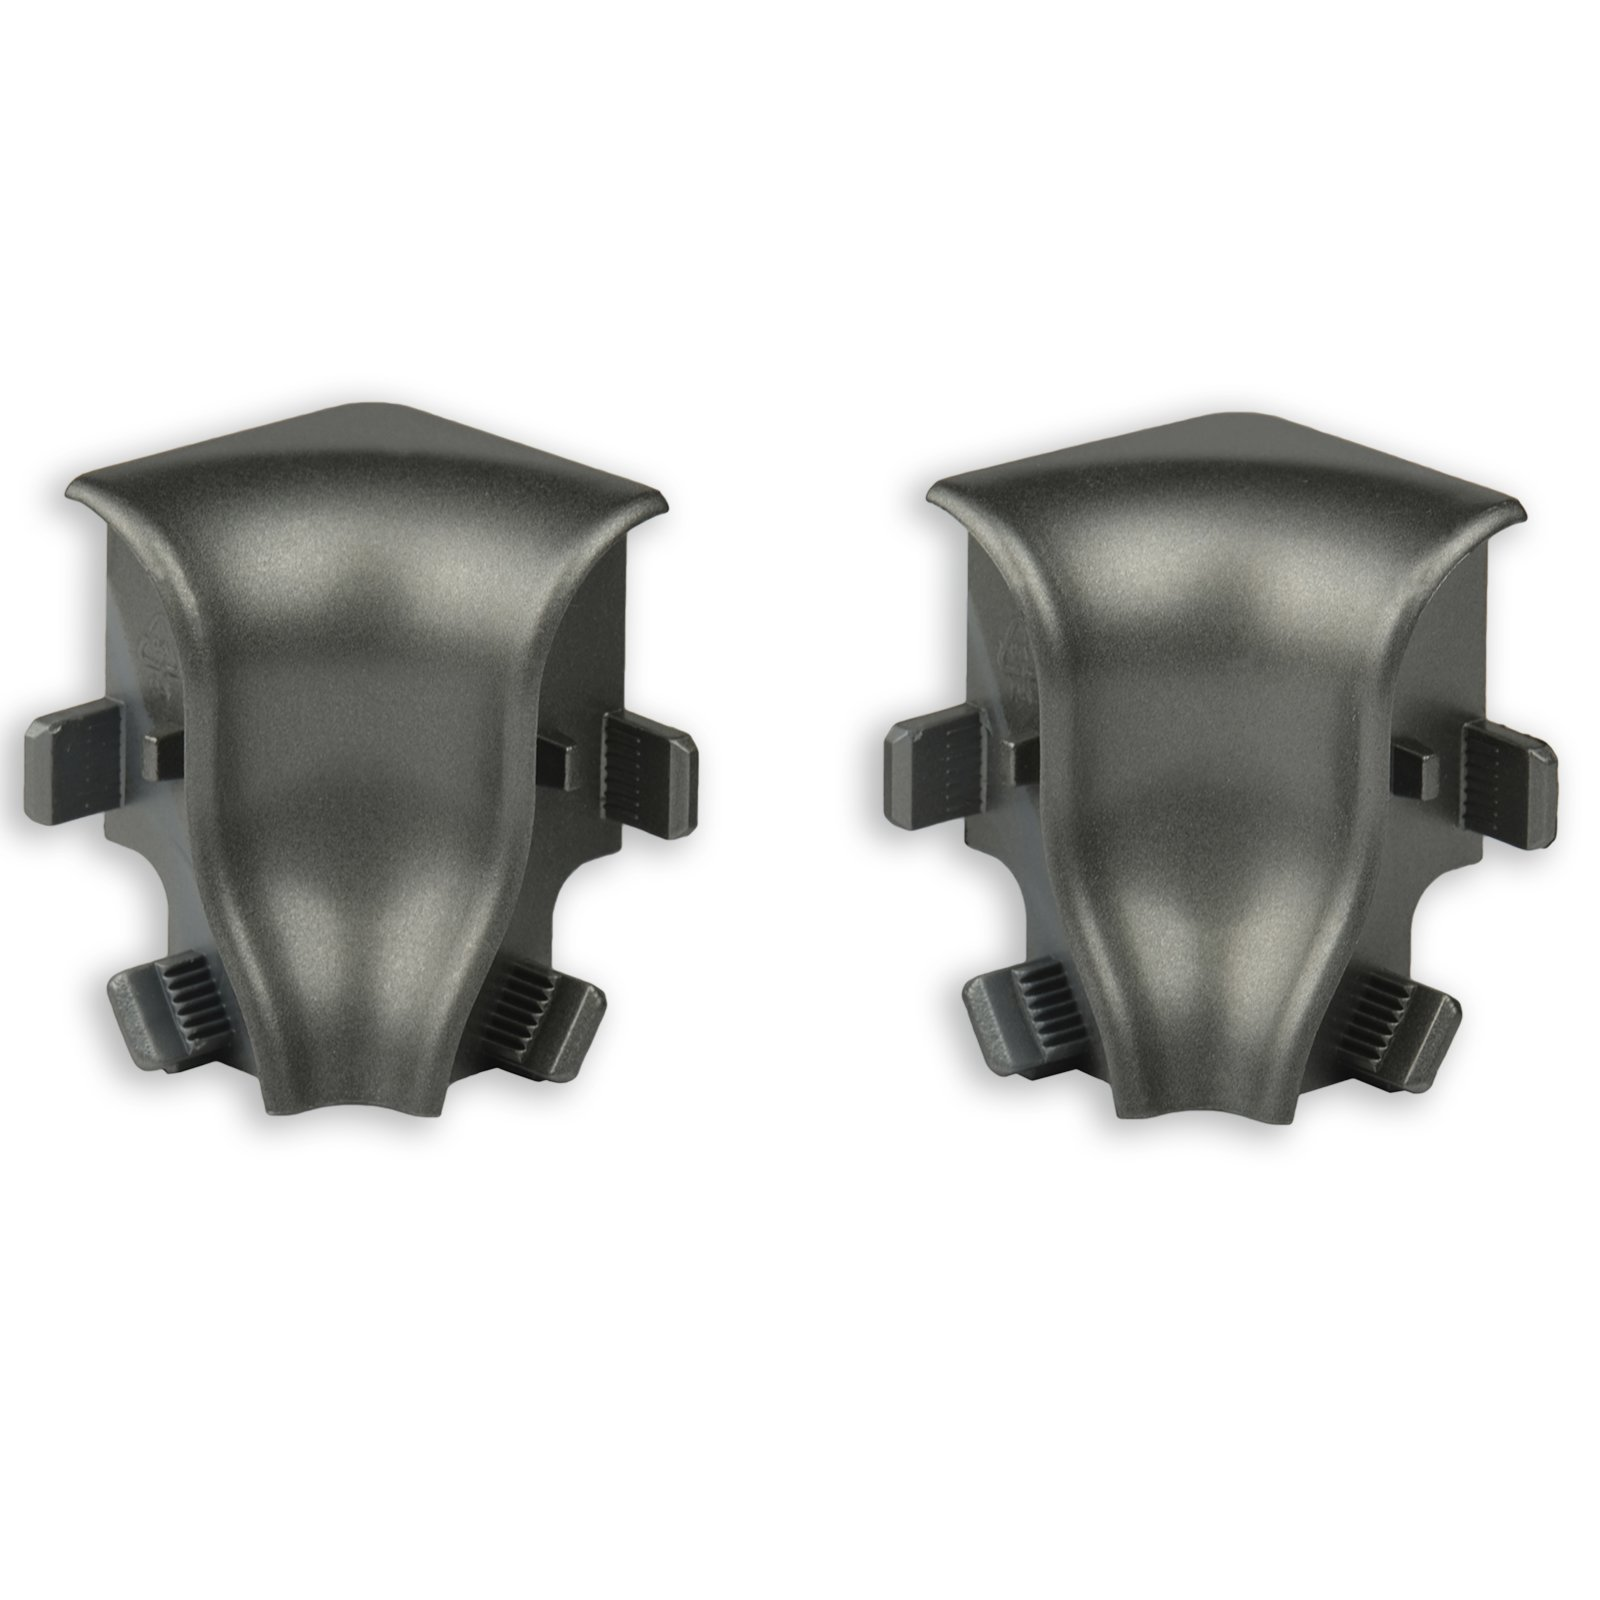 2er-Set Innenecken - Silber dunkel - für Sockelleiste K40